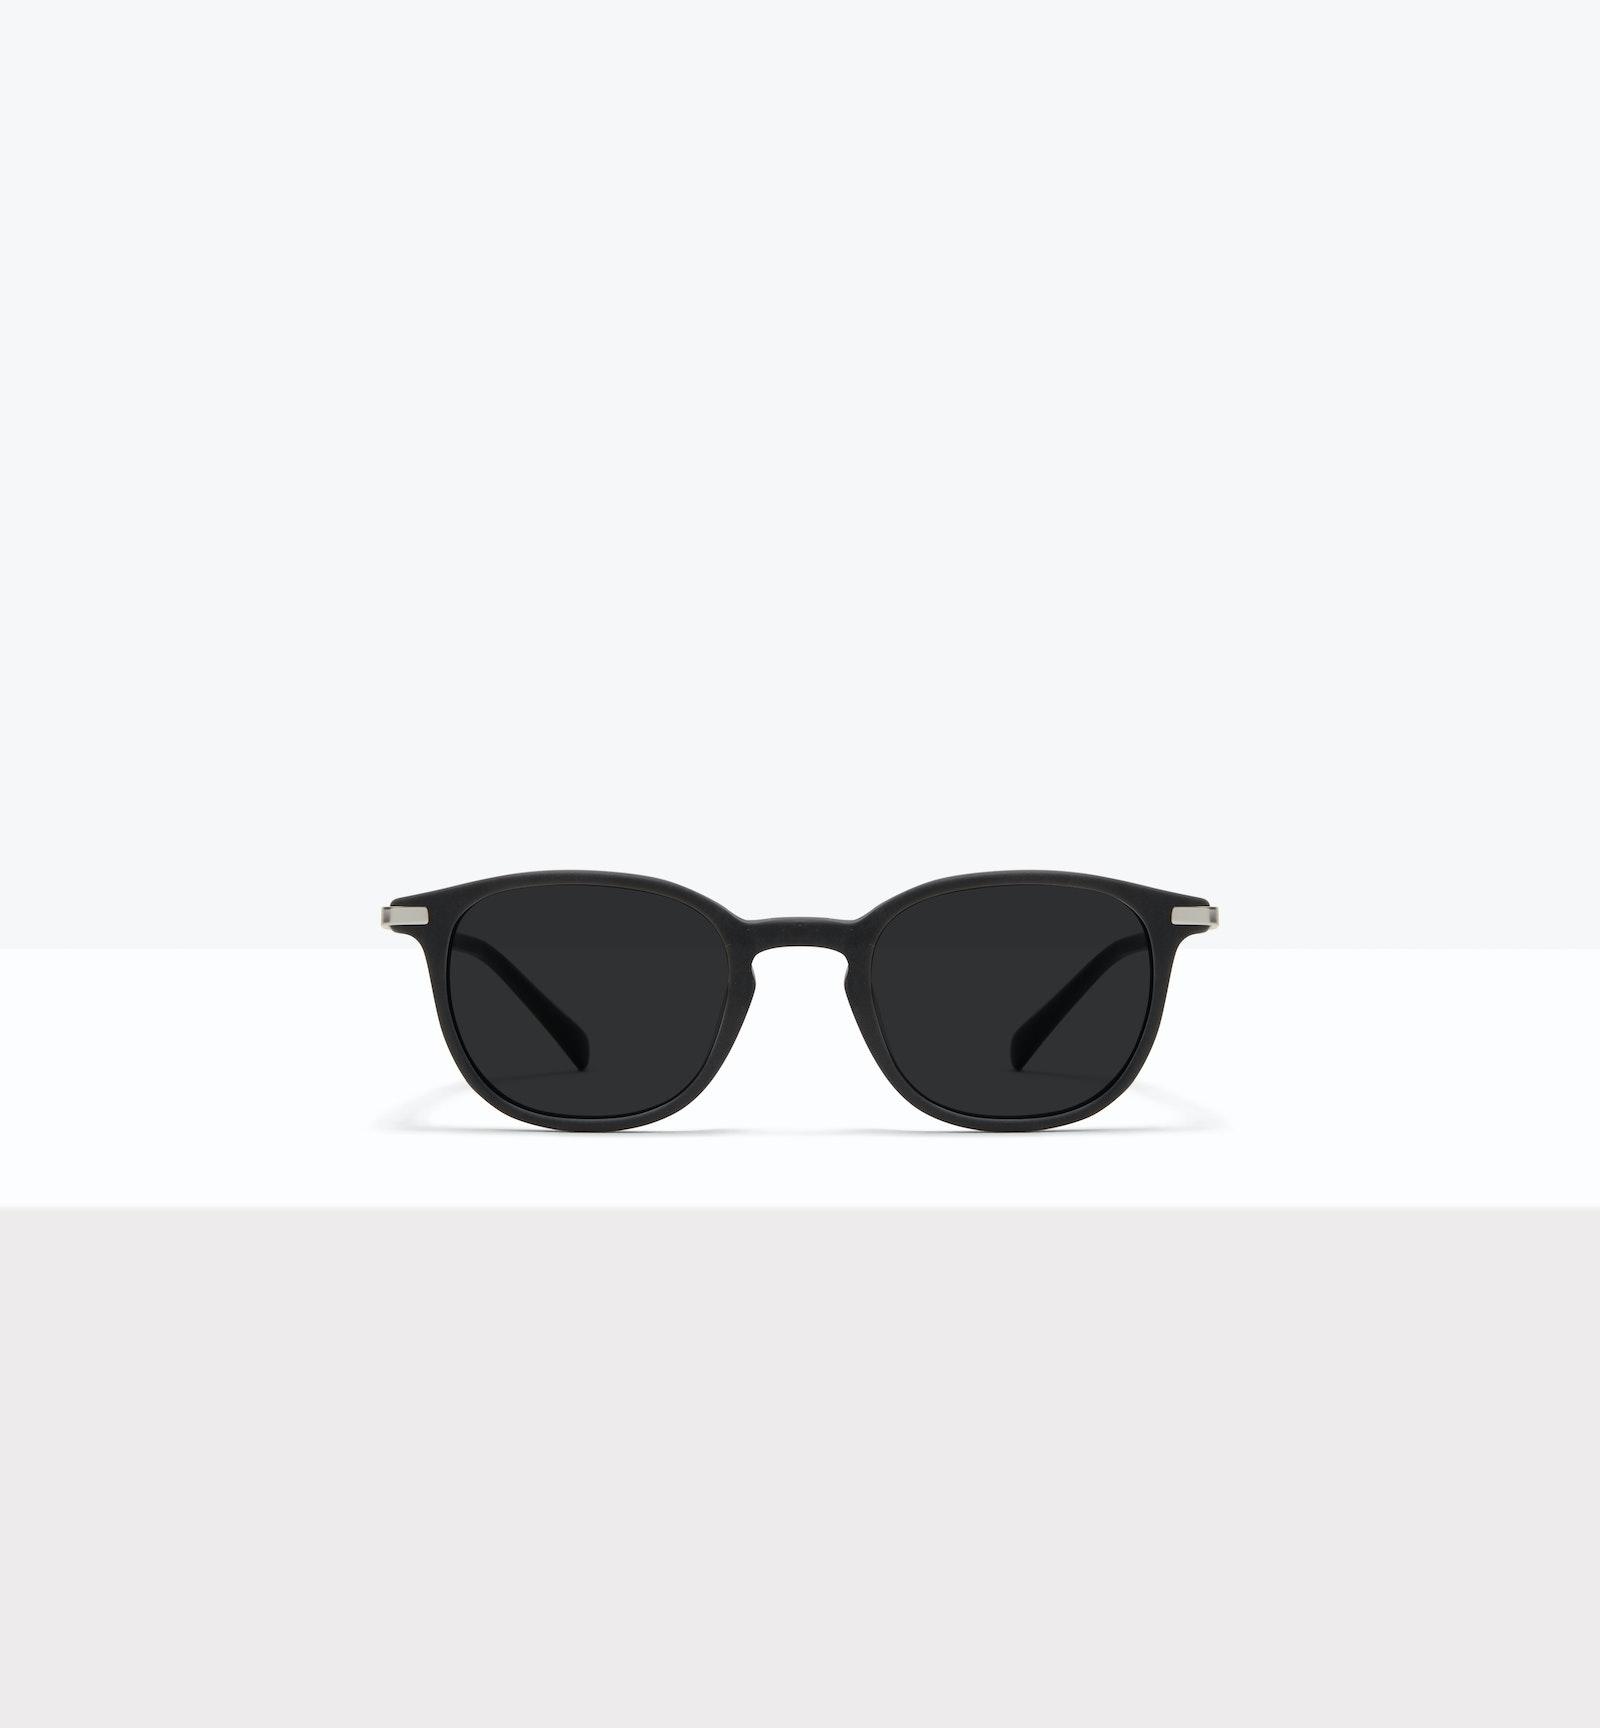 Affordable Fashion Glasses Round Sunglasses Men Tux M Matte Black